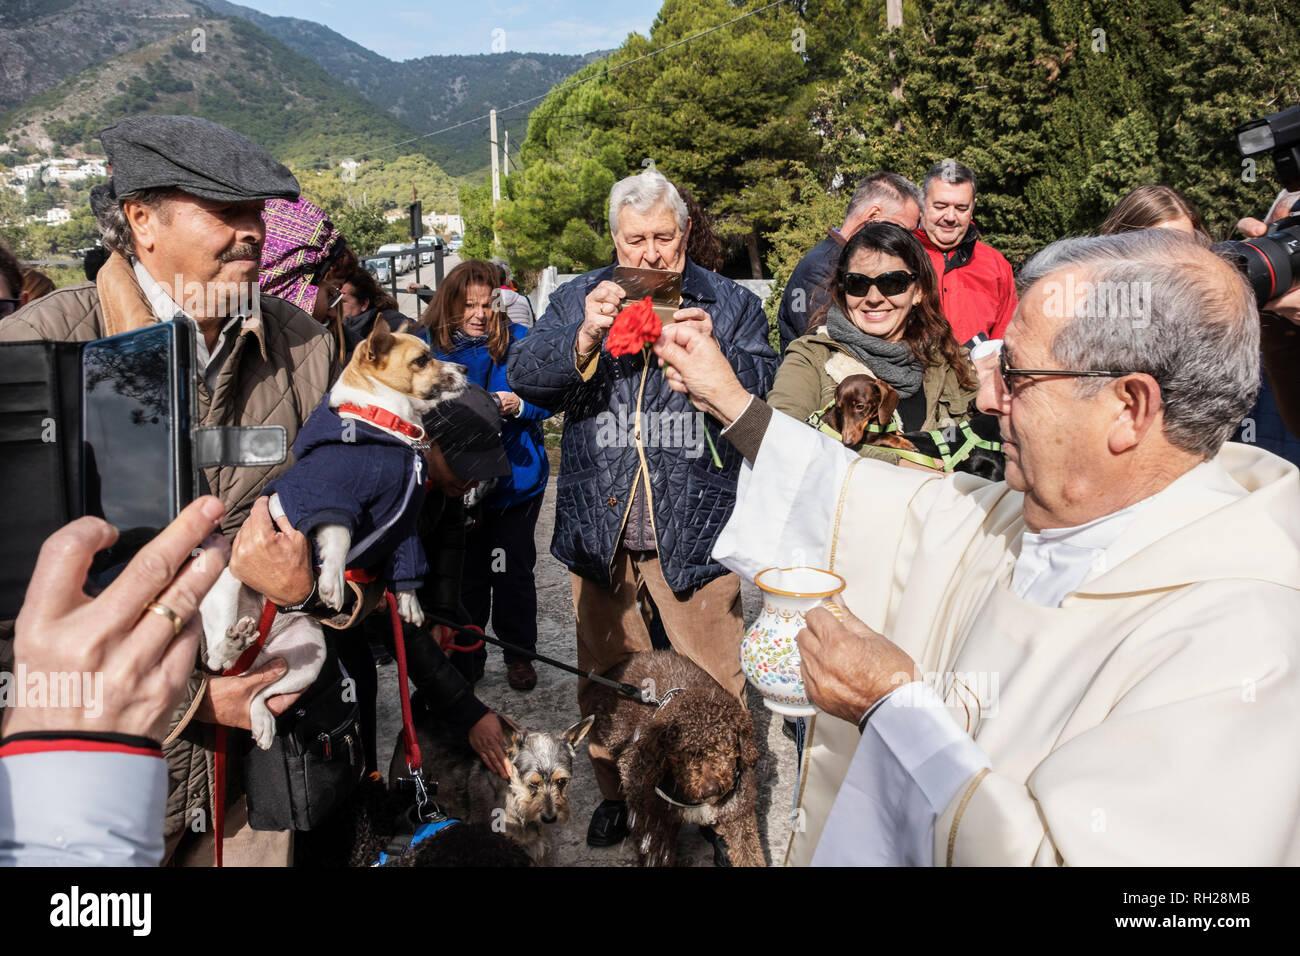 Animals blessing, pilgrimage of San Anton. White village of Mijas Pueblo. Malaga province, Costa del Sol. Andalusia southern Spain. Europe - Stock Image